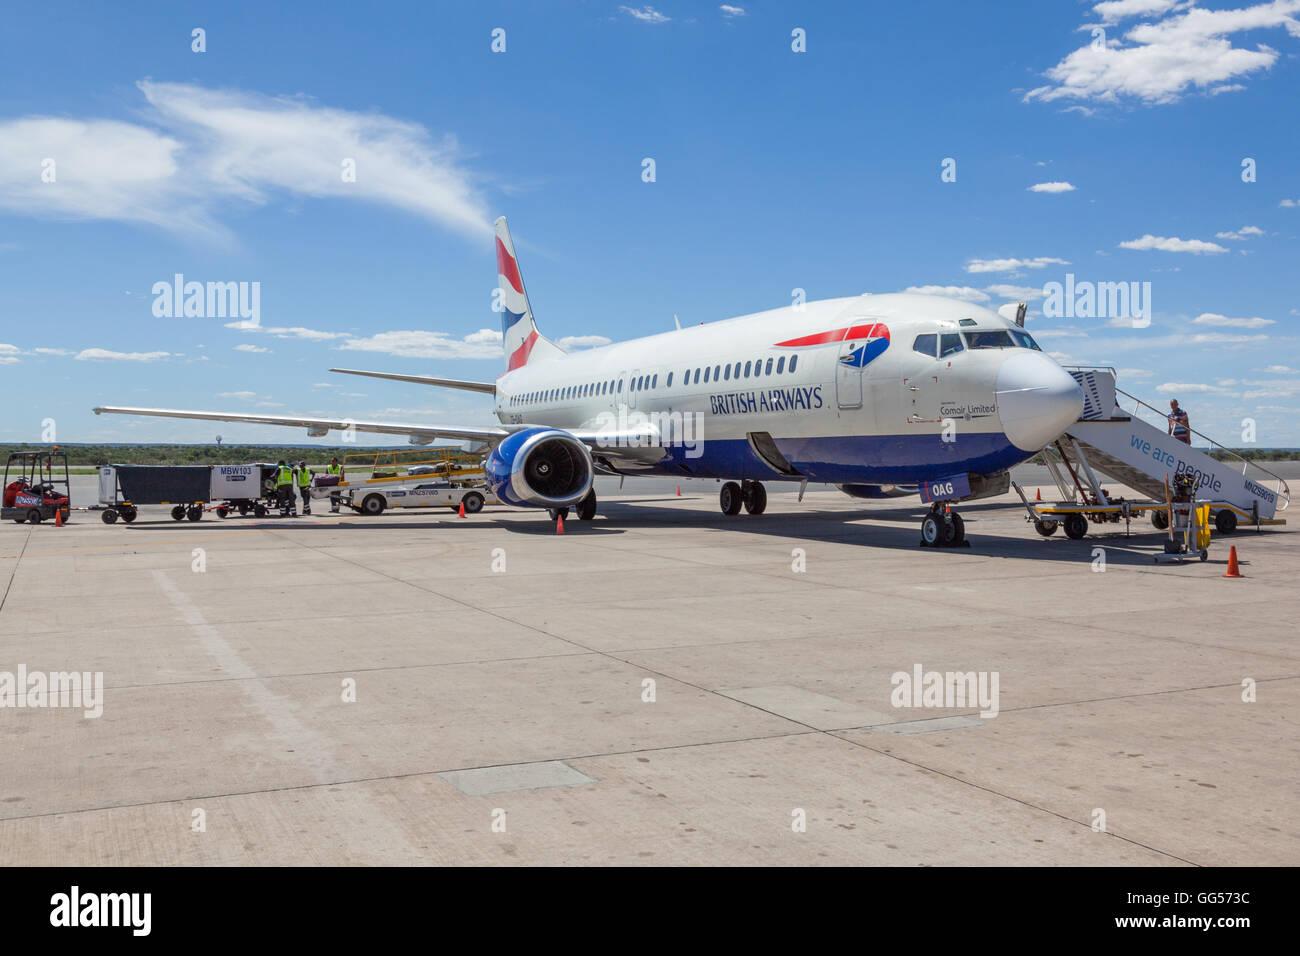 Namibia British Airways, Comair, Boeing 737 ZS-OAG, at Windhoek Hosea Kutako International Airport - Stock Image